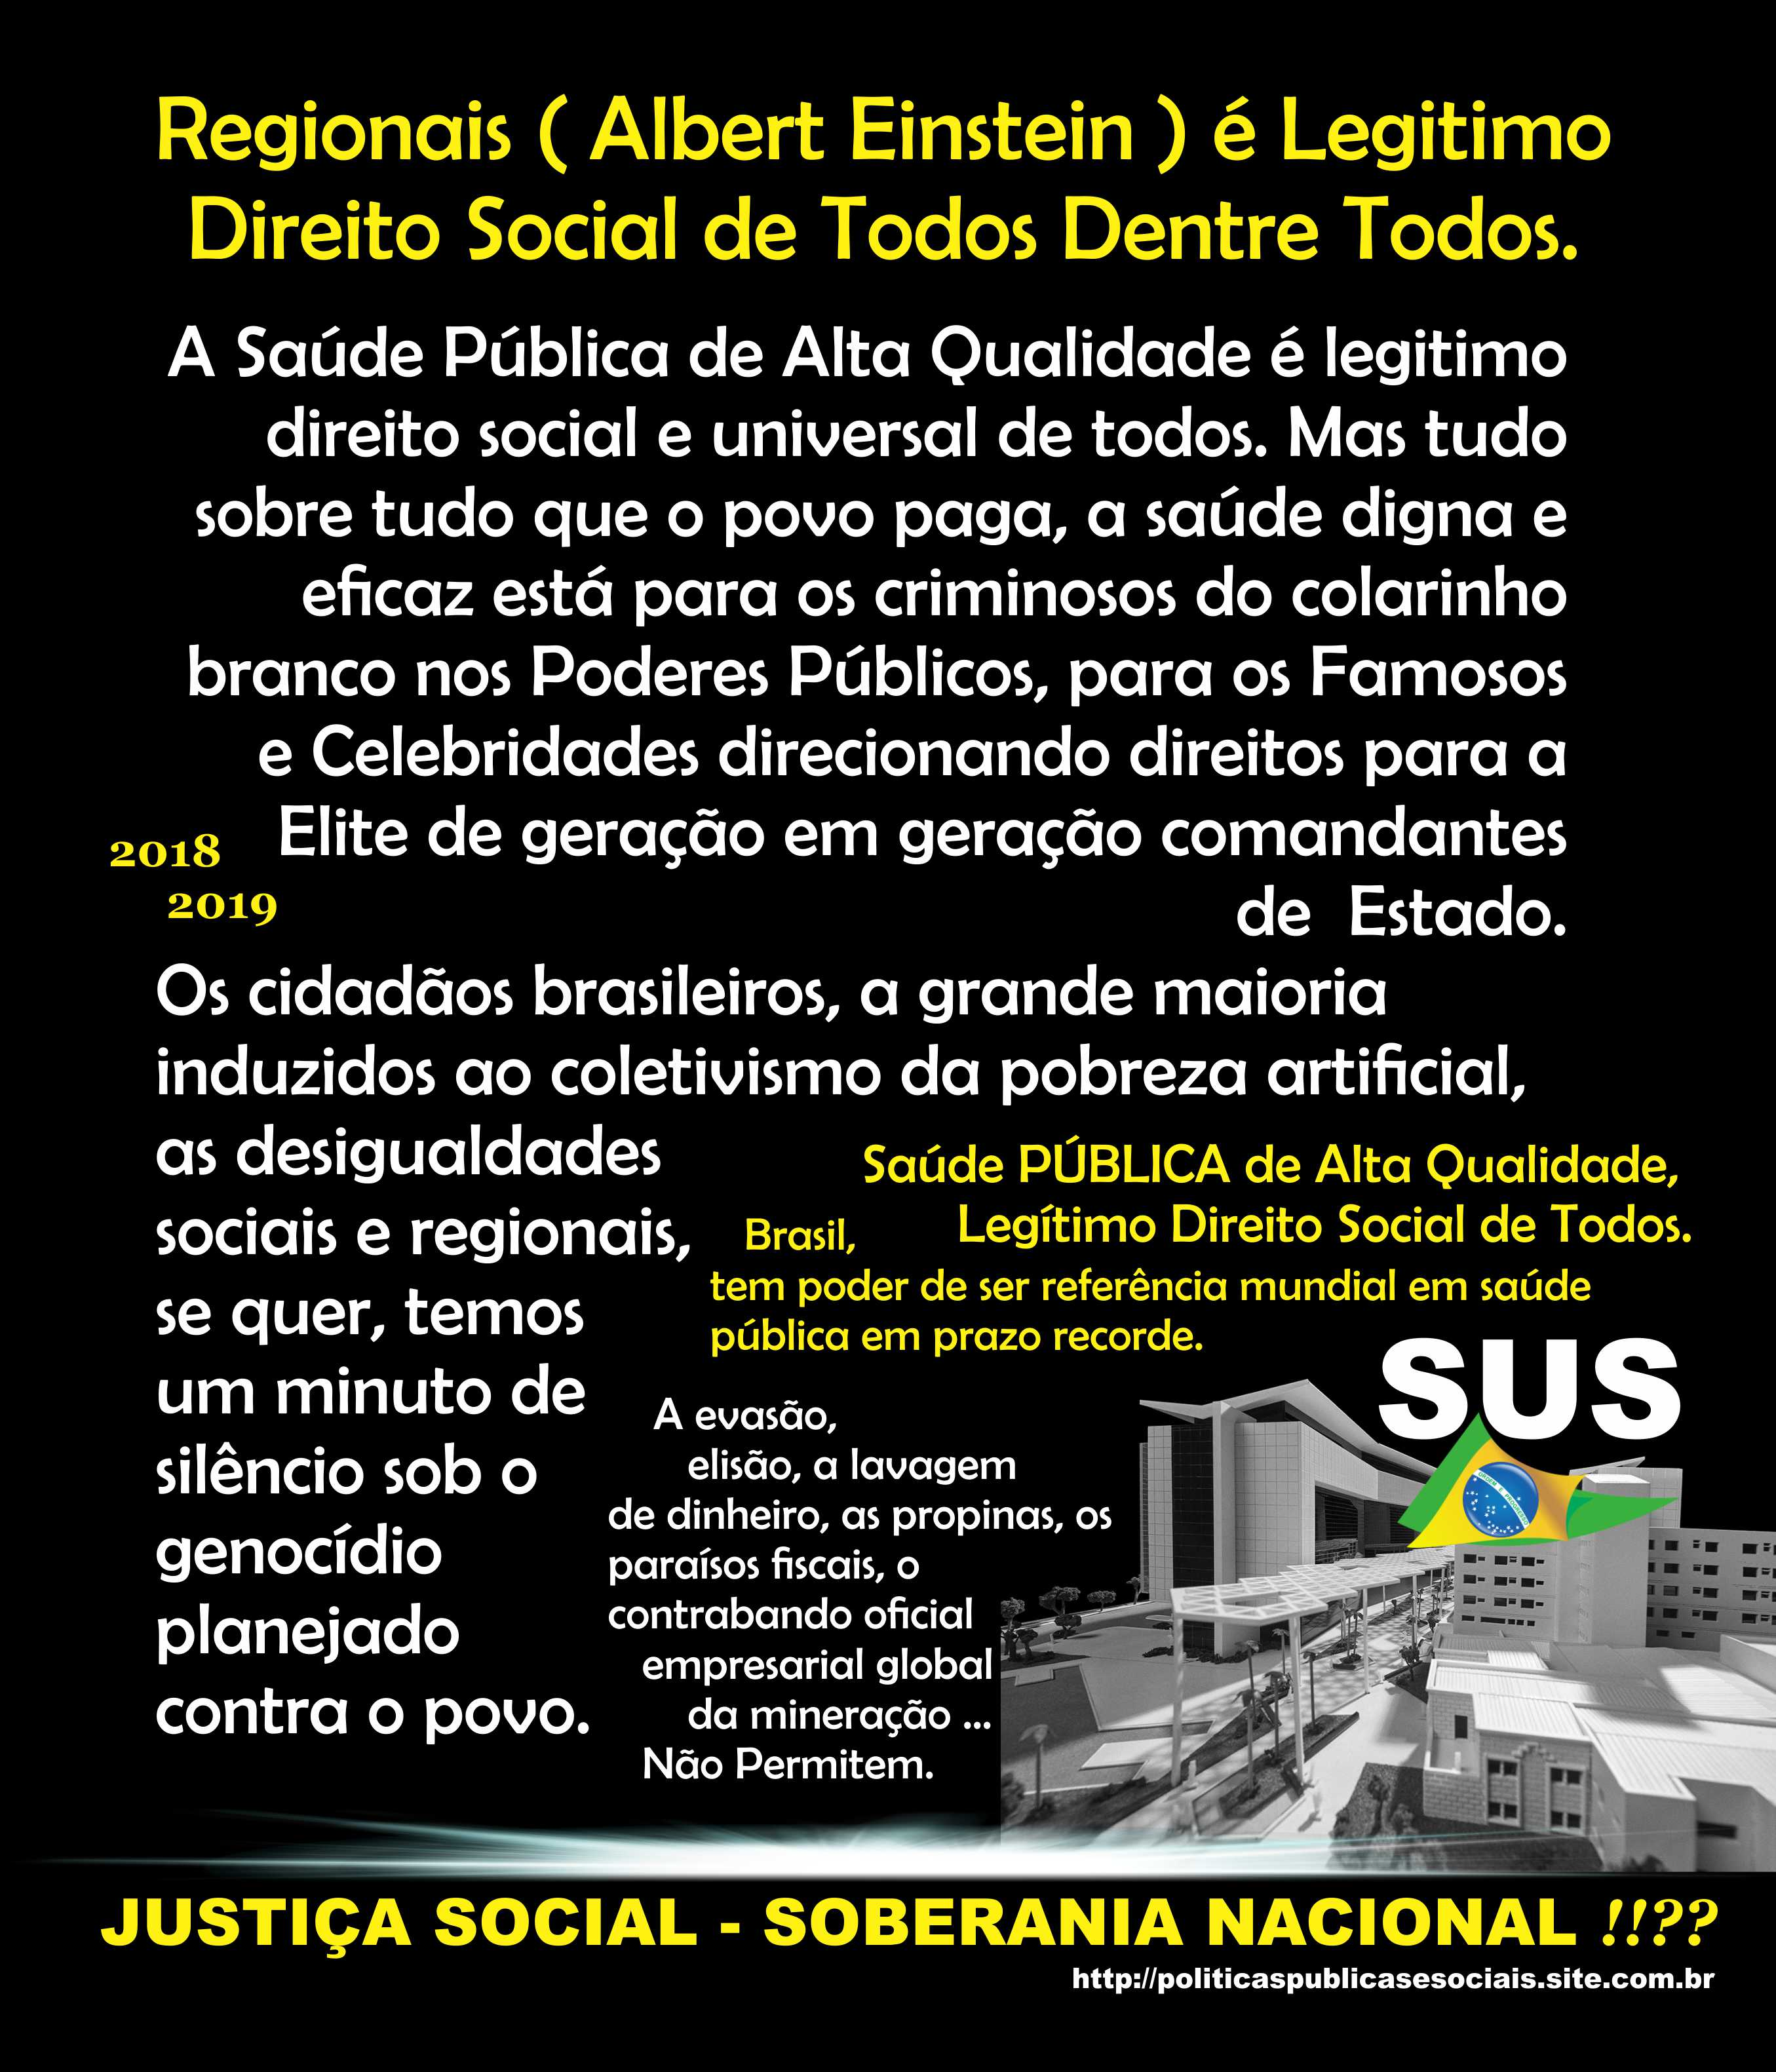 SUS Sistema Ùnico de Saúde BRASIL